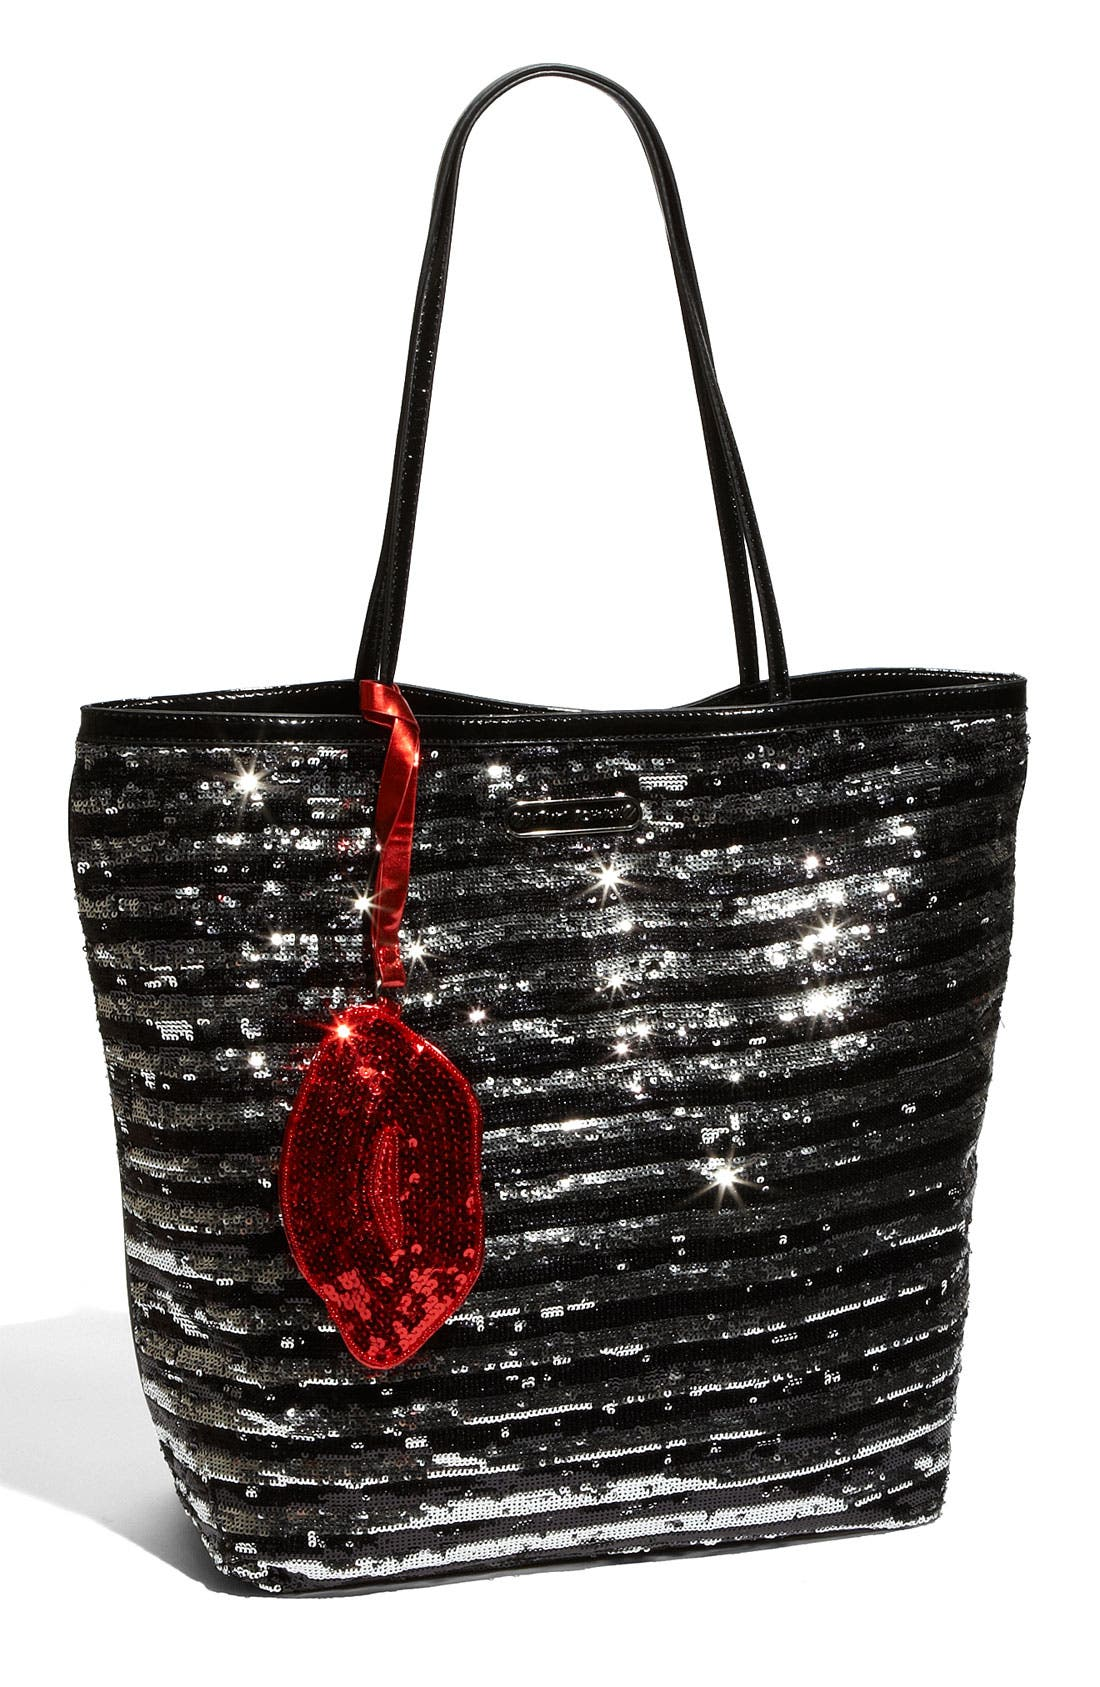 Alternate Image 1 Selected - Betsey Johnson 'Glitzed - Medium' Sequined Shopper